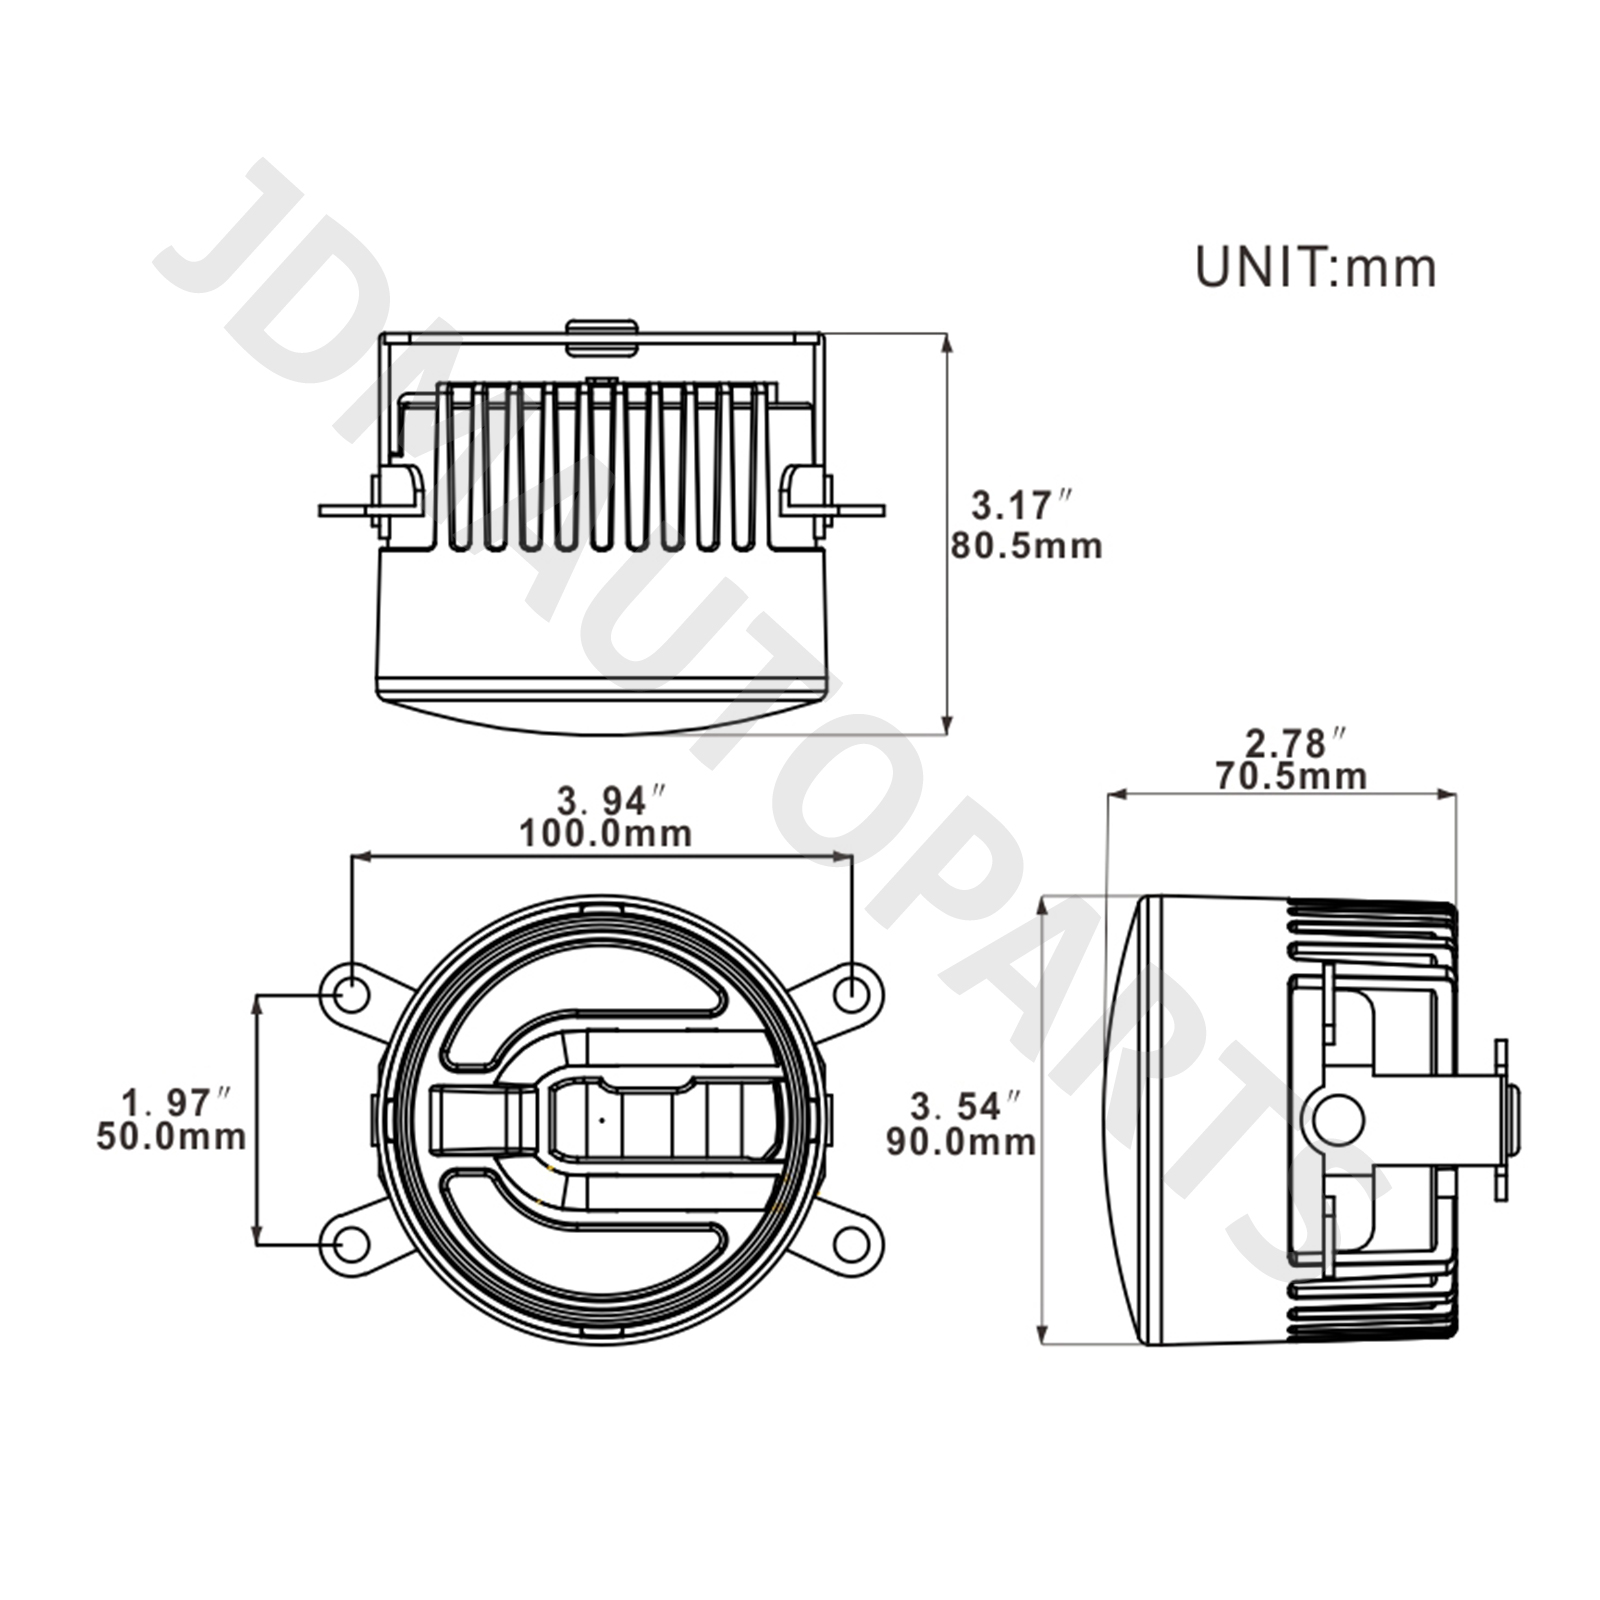 Holden Vf Wiring Diagram